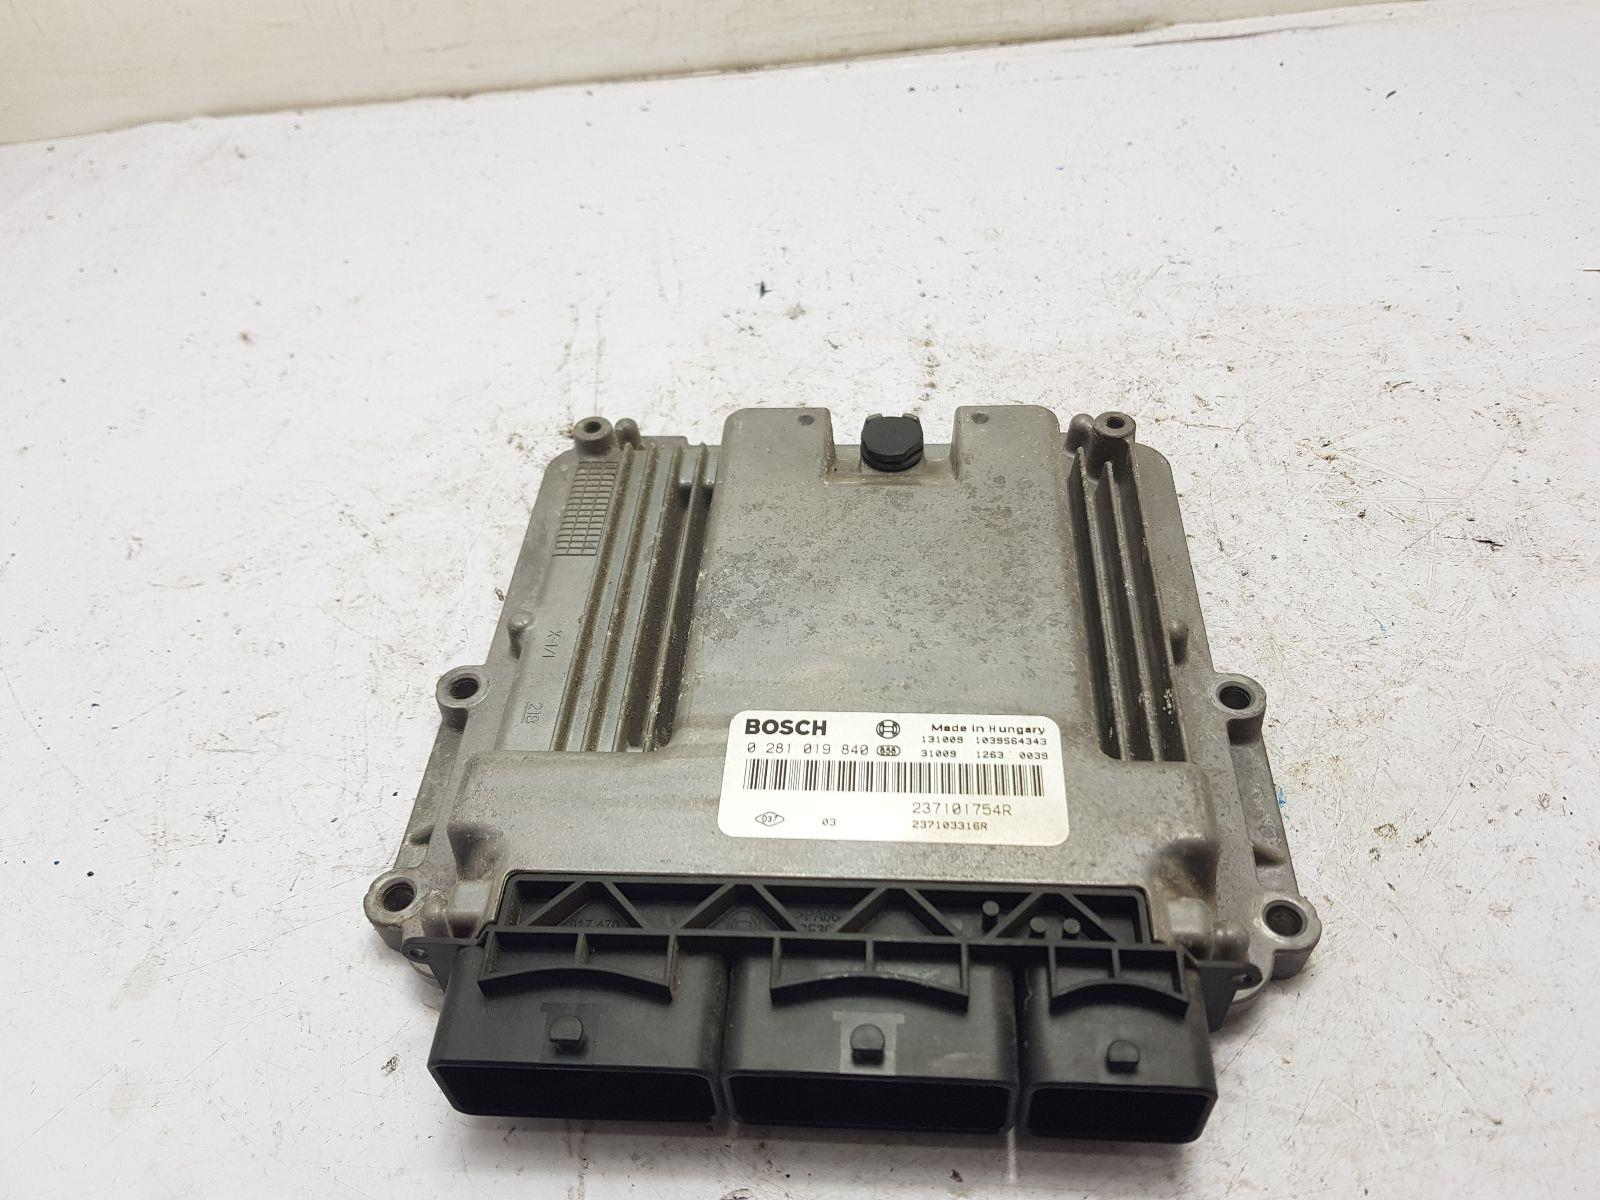 2006-2014 MK1 VAUXHALL VIVARO ENGINE ECU 2.0 DIESEL 237101754R